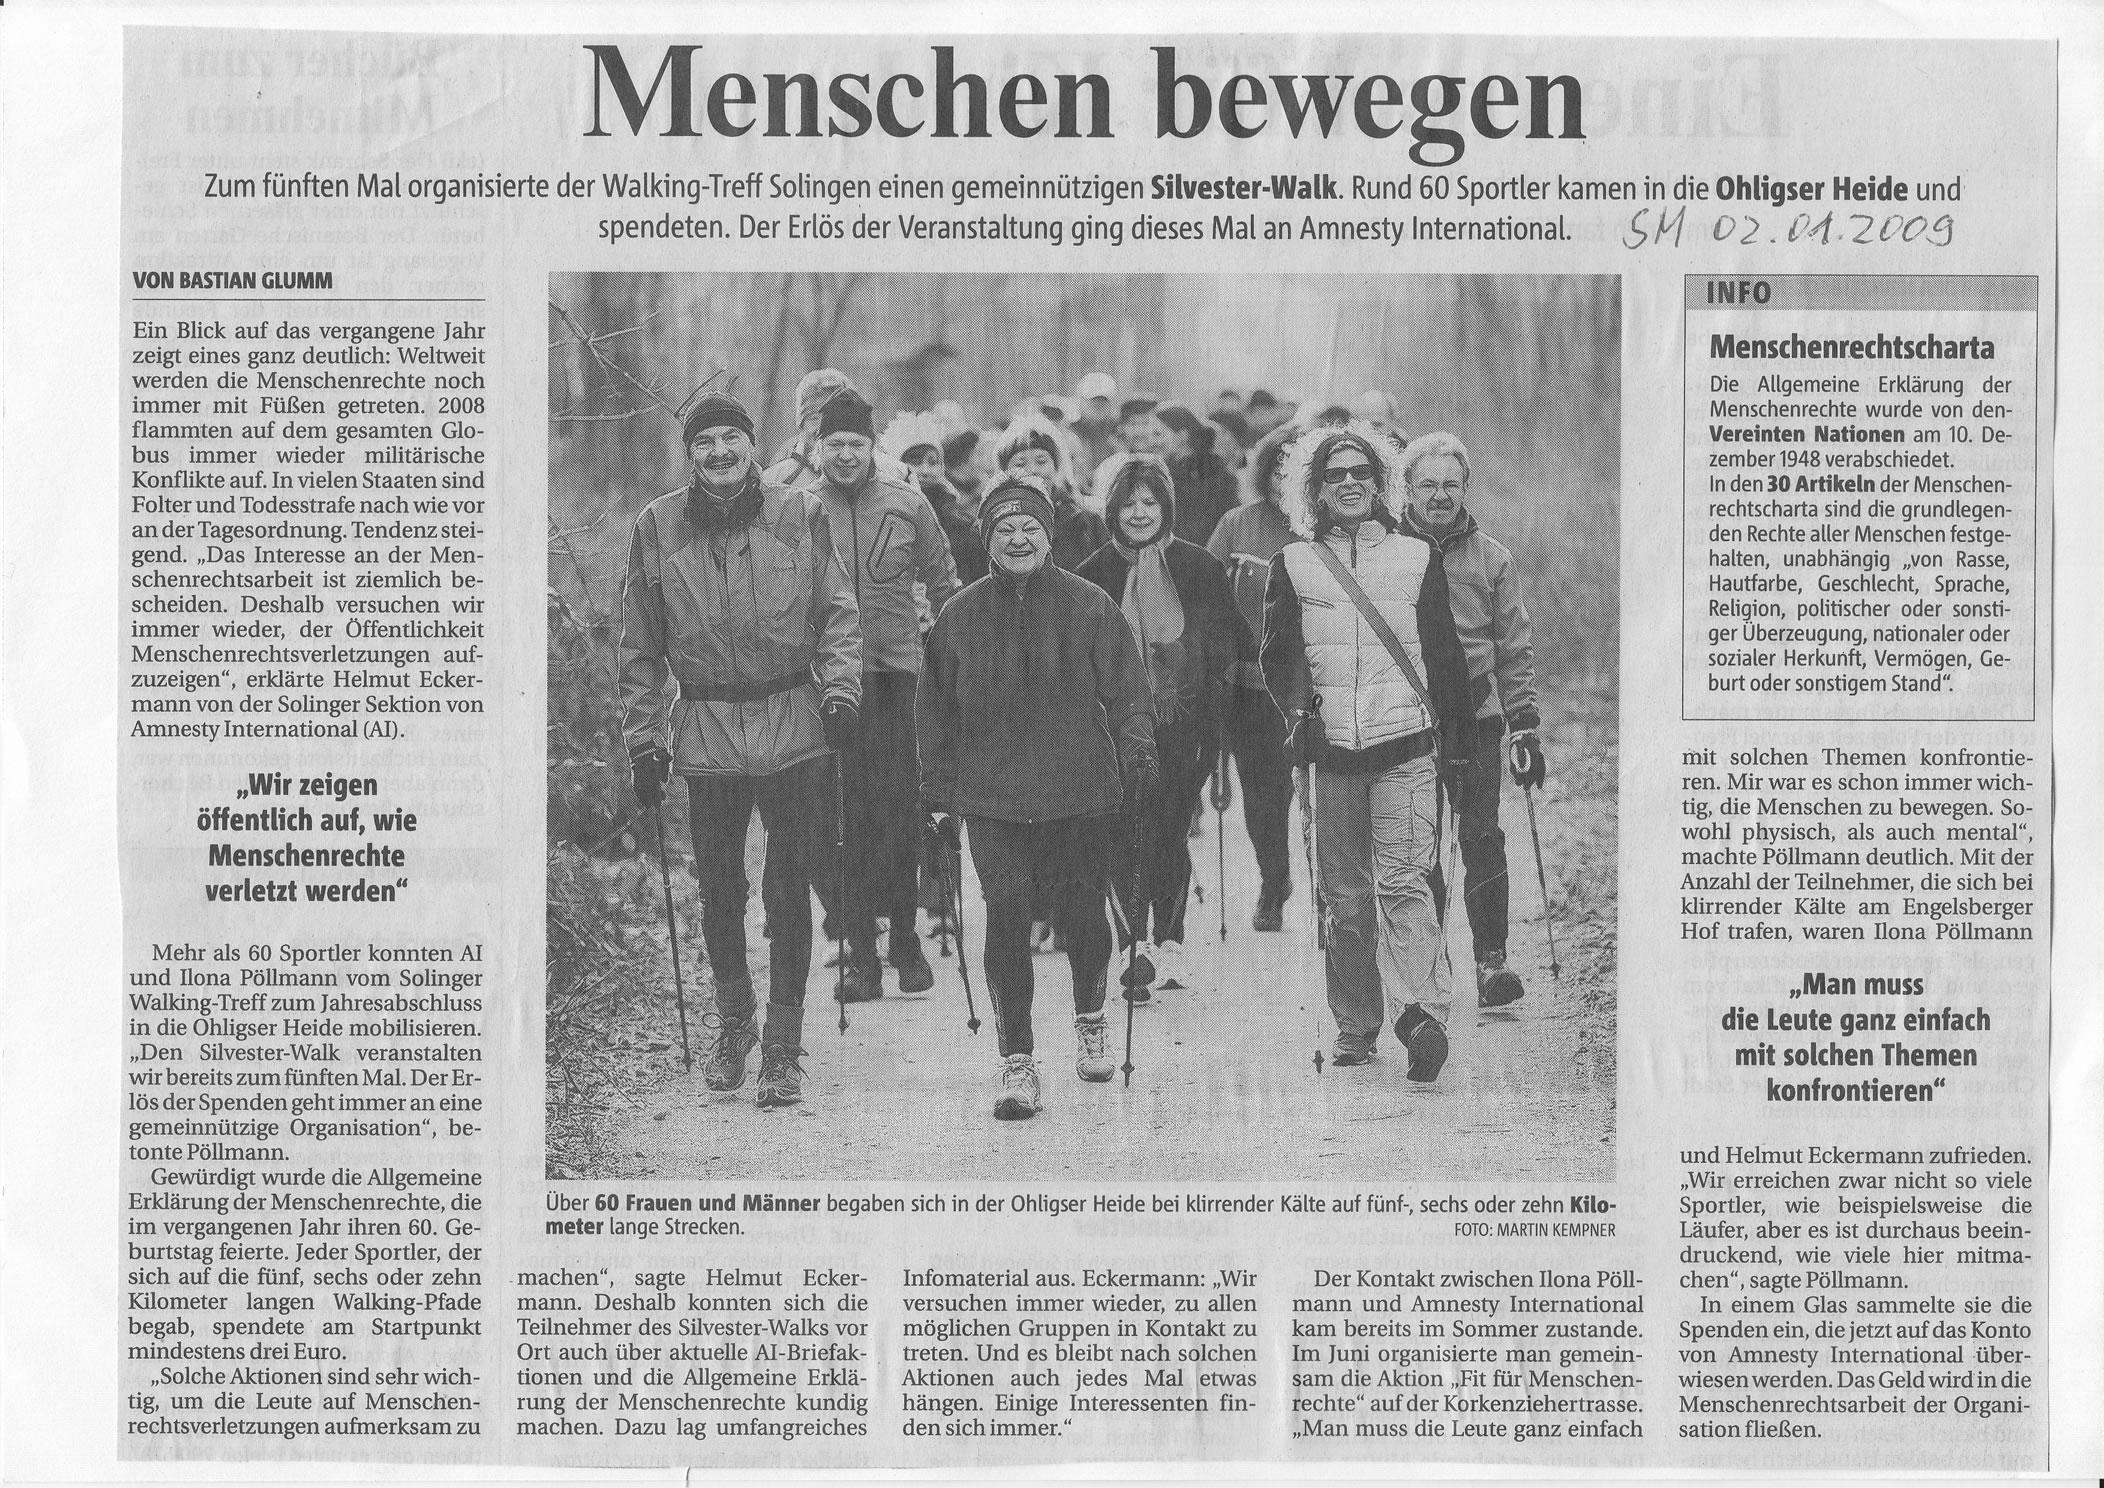 Solinger Morgenpost 01/09: Silvester-Walk für Menschenrechte